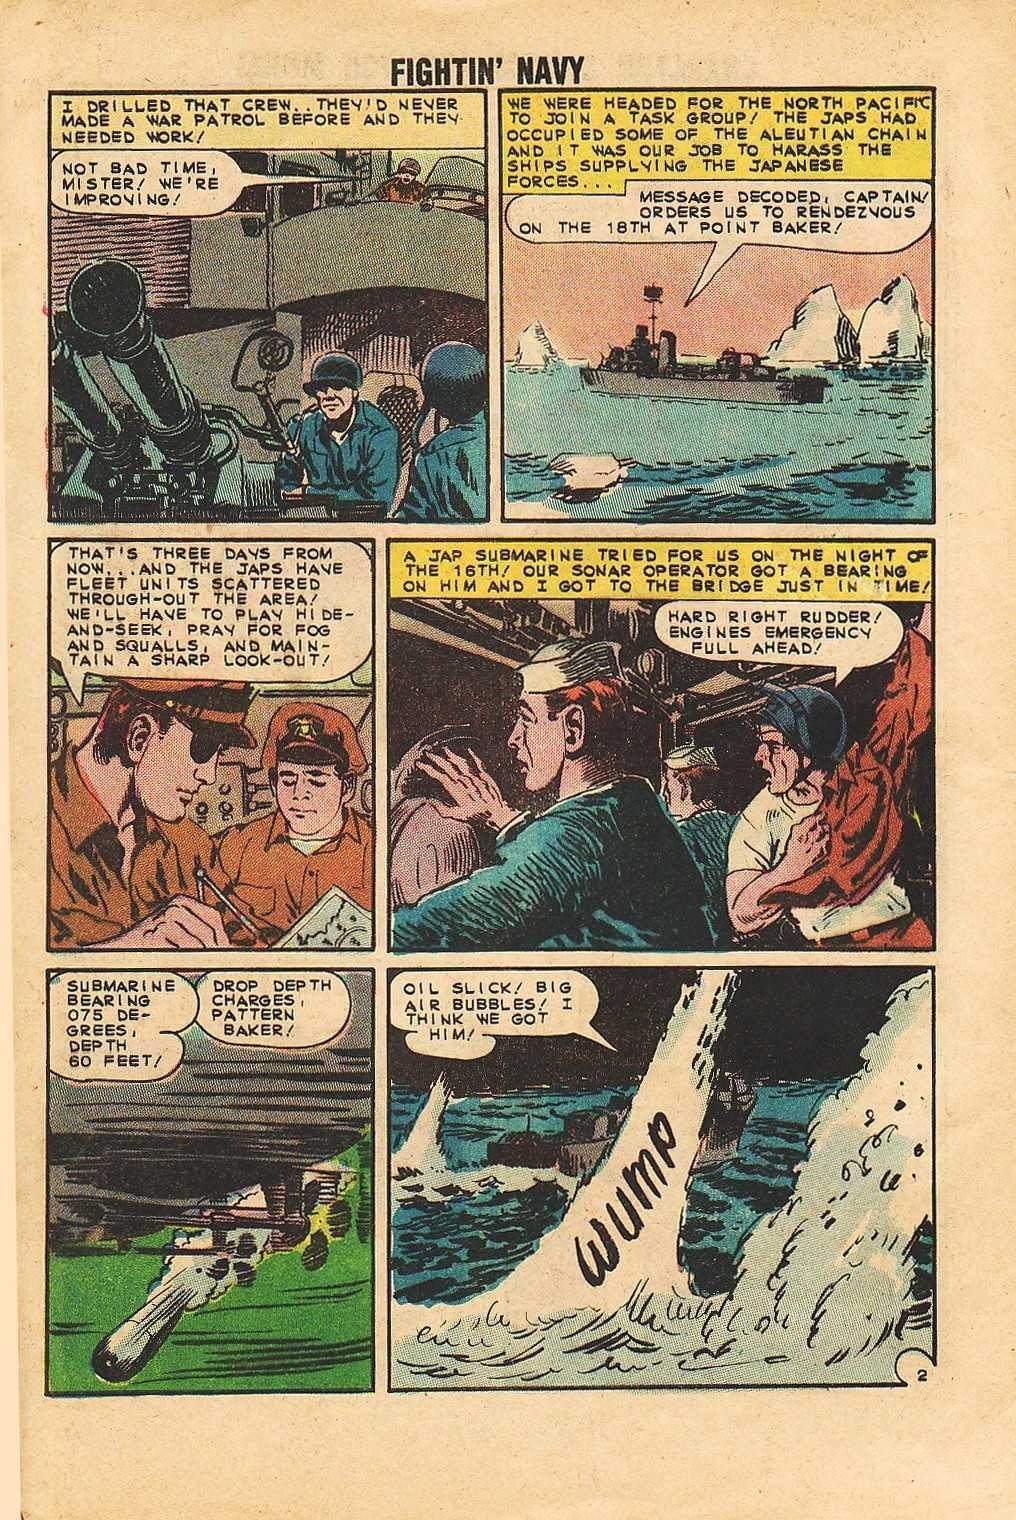 Read online Fightin' Navy comic -  Issue #113 - 4